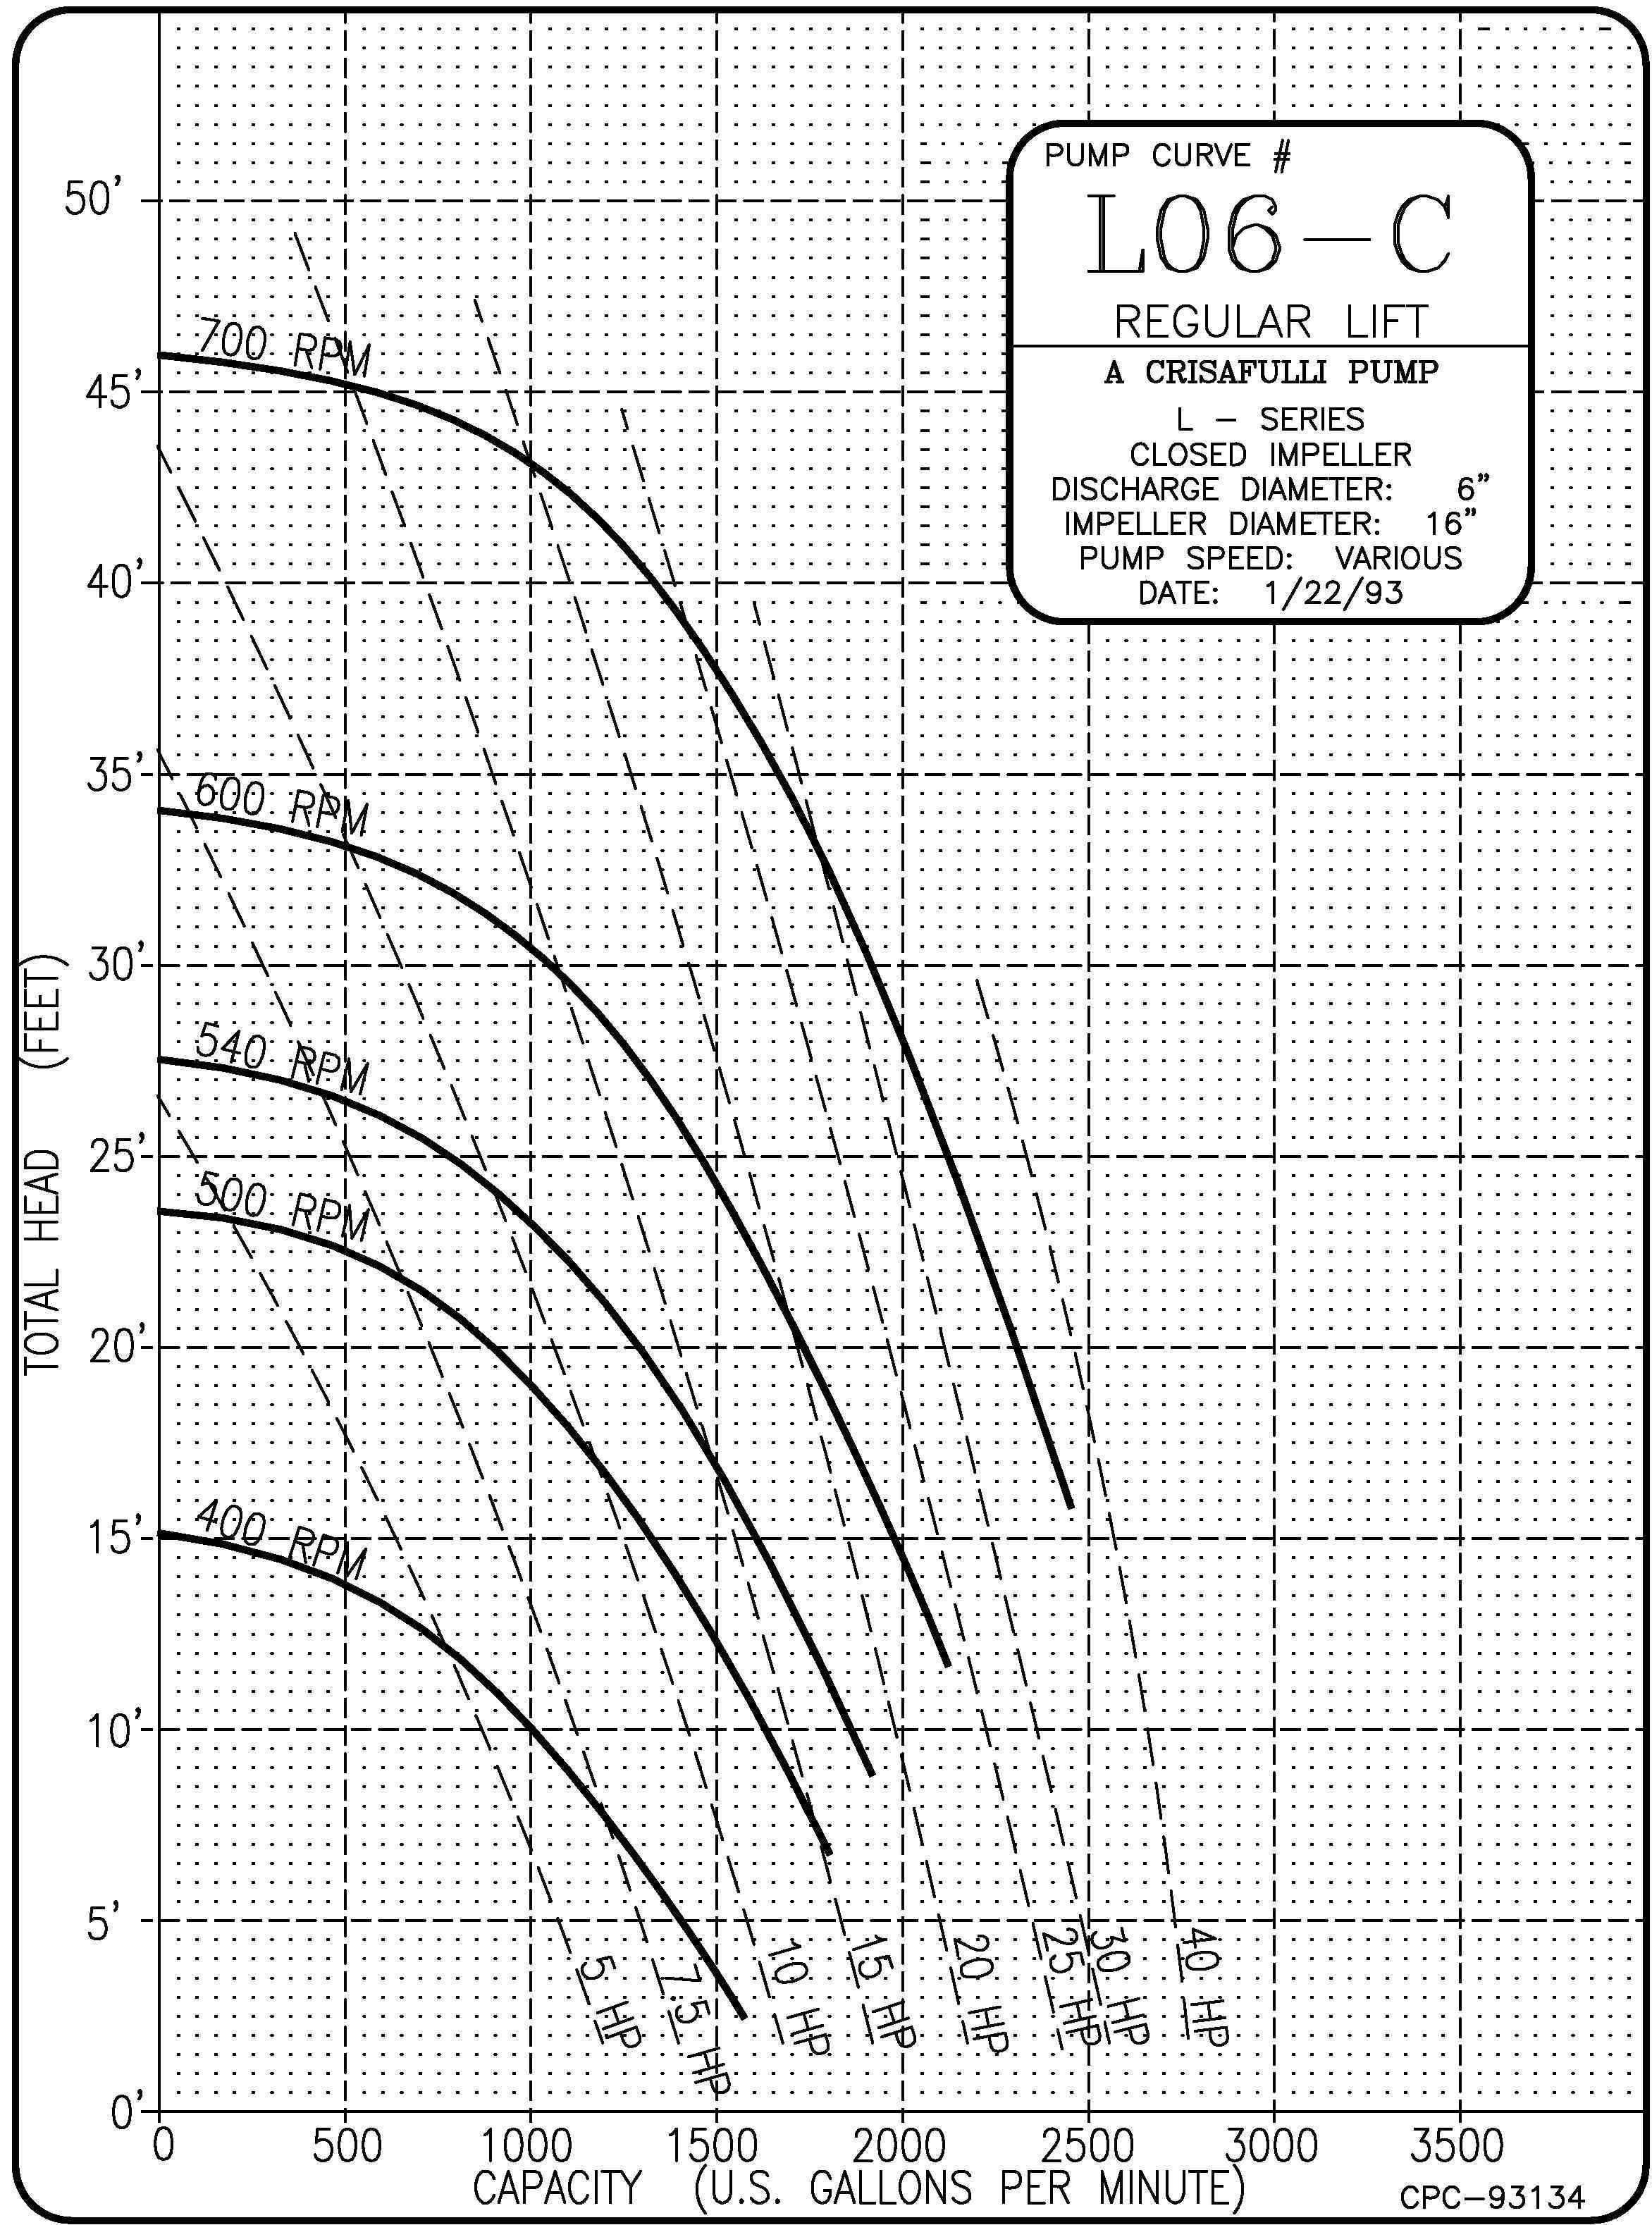 6in Regular Lift Curve